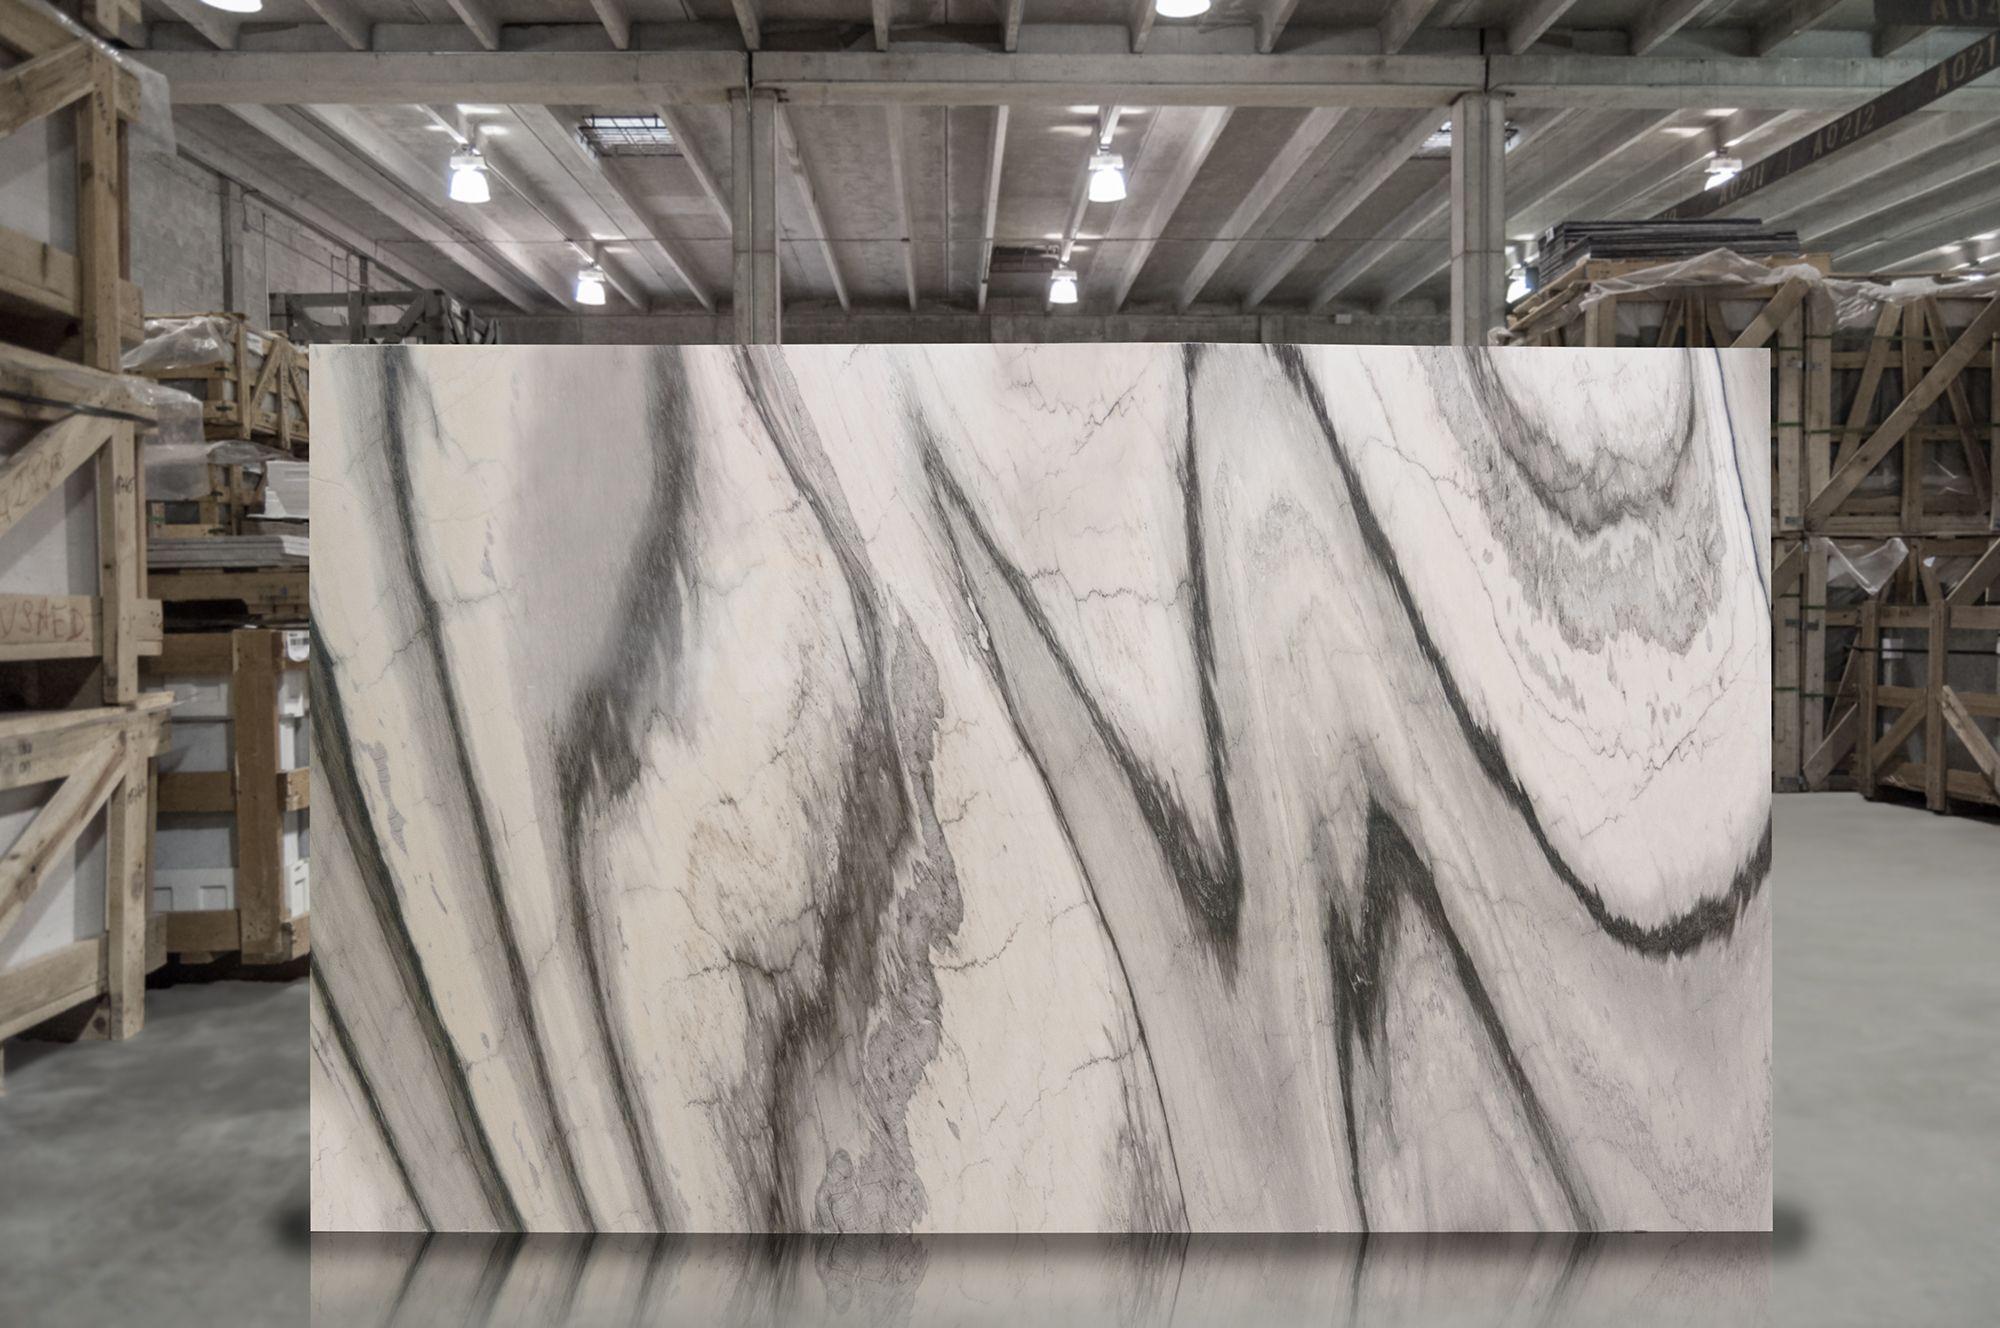 cipolino grigio polished marble slab #opustone #naturalstone